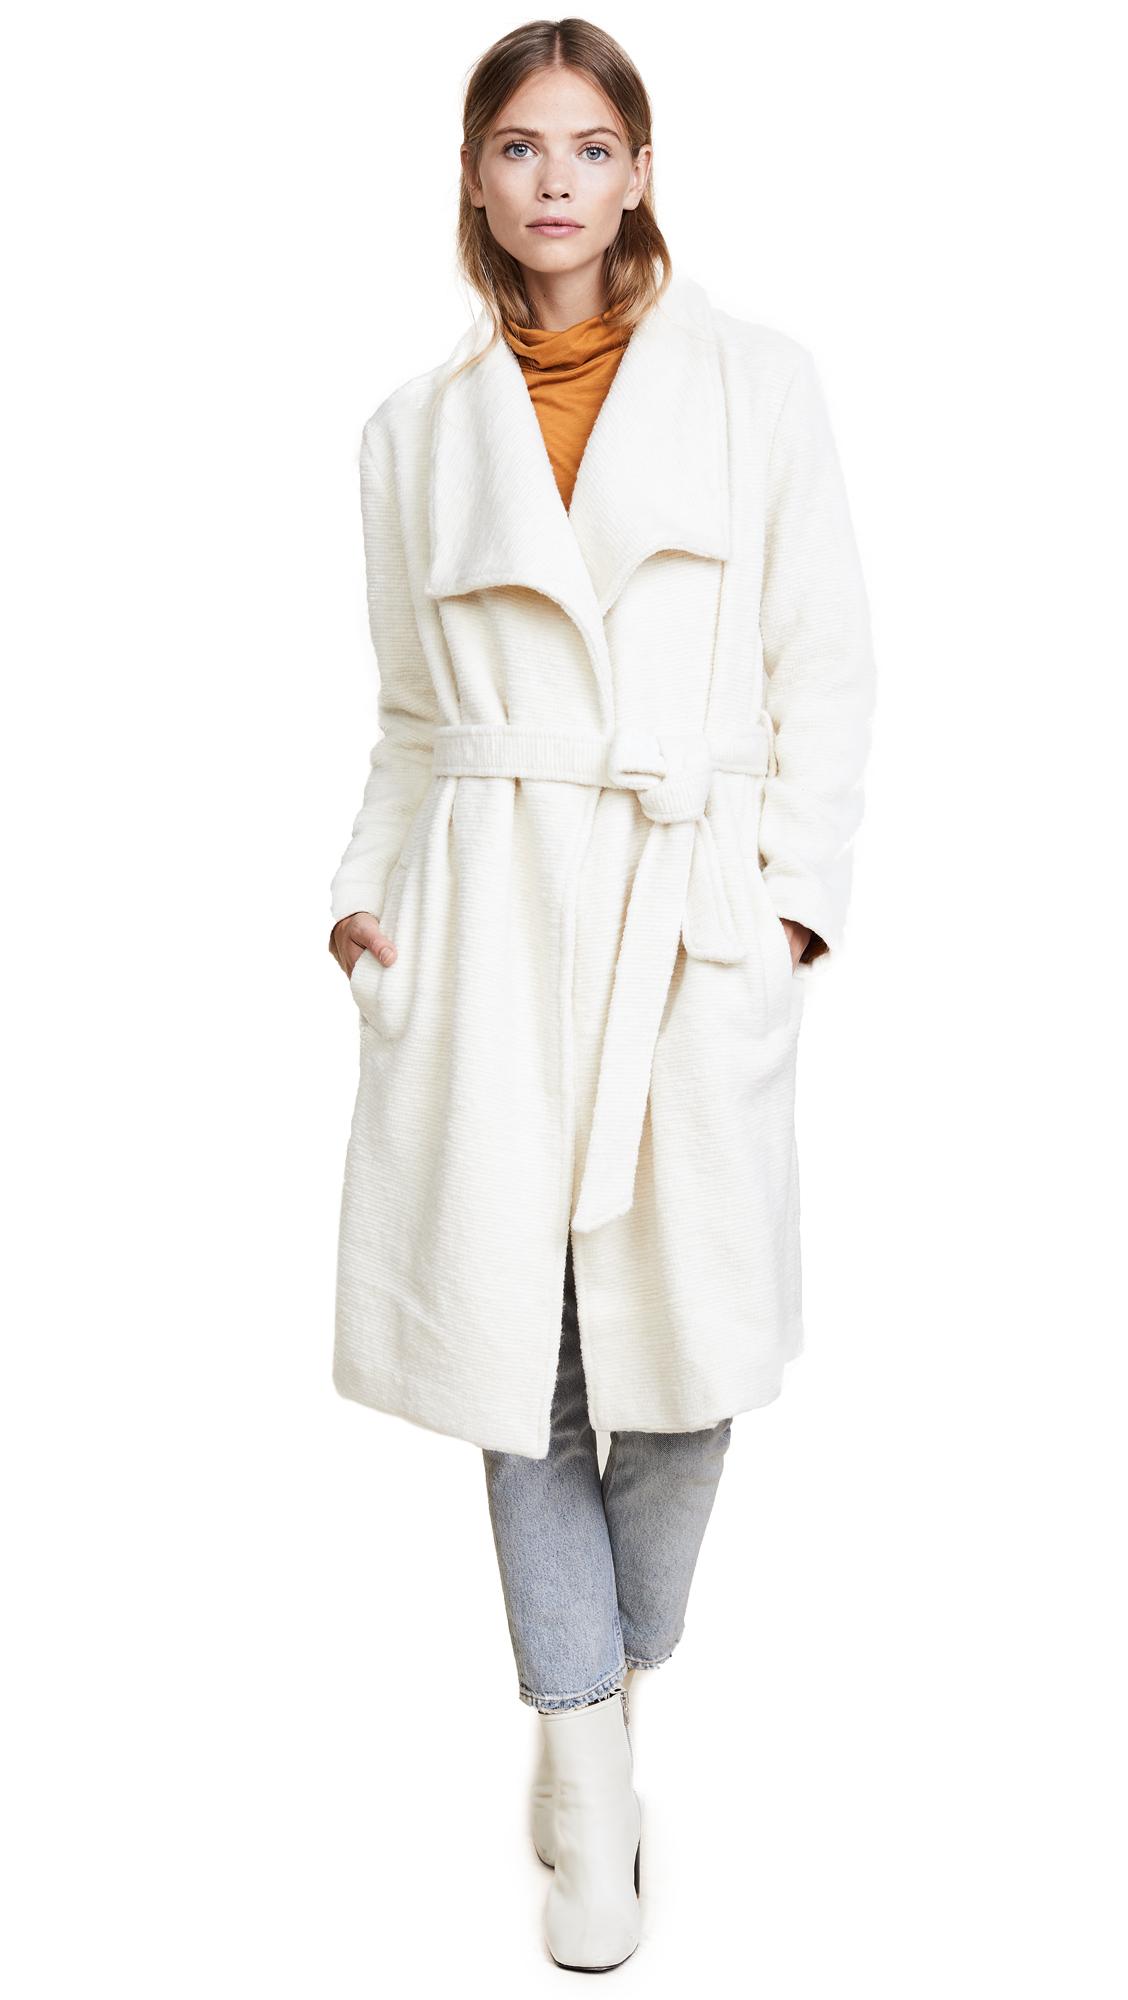 BB Dakota Isaac Coat - Oyster